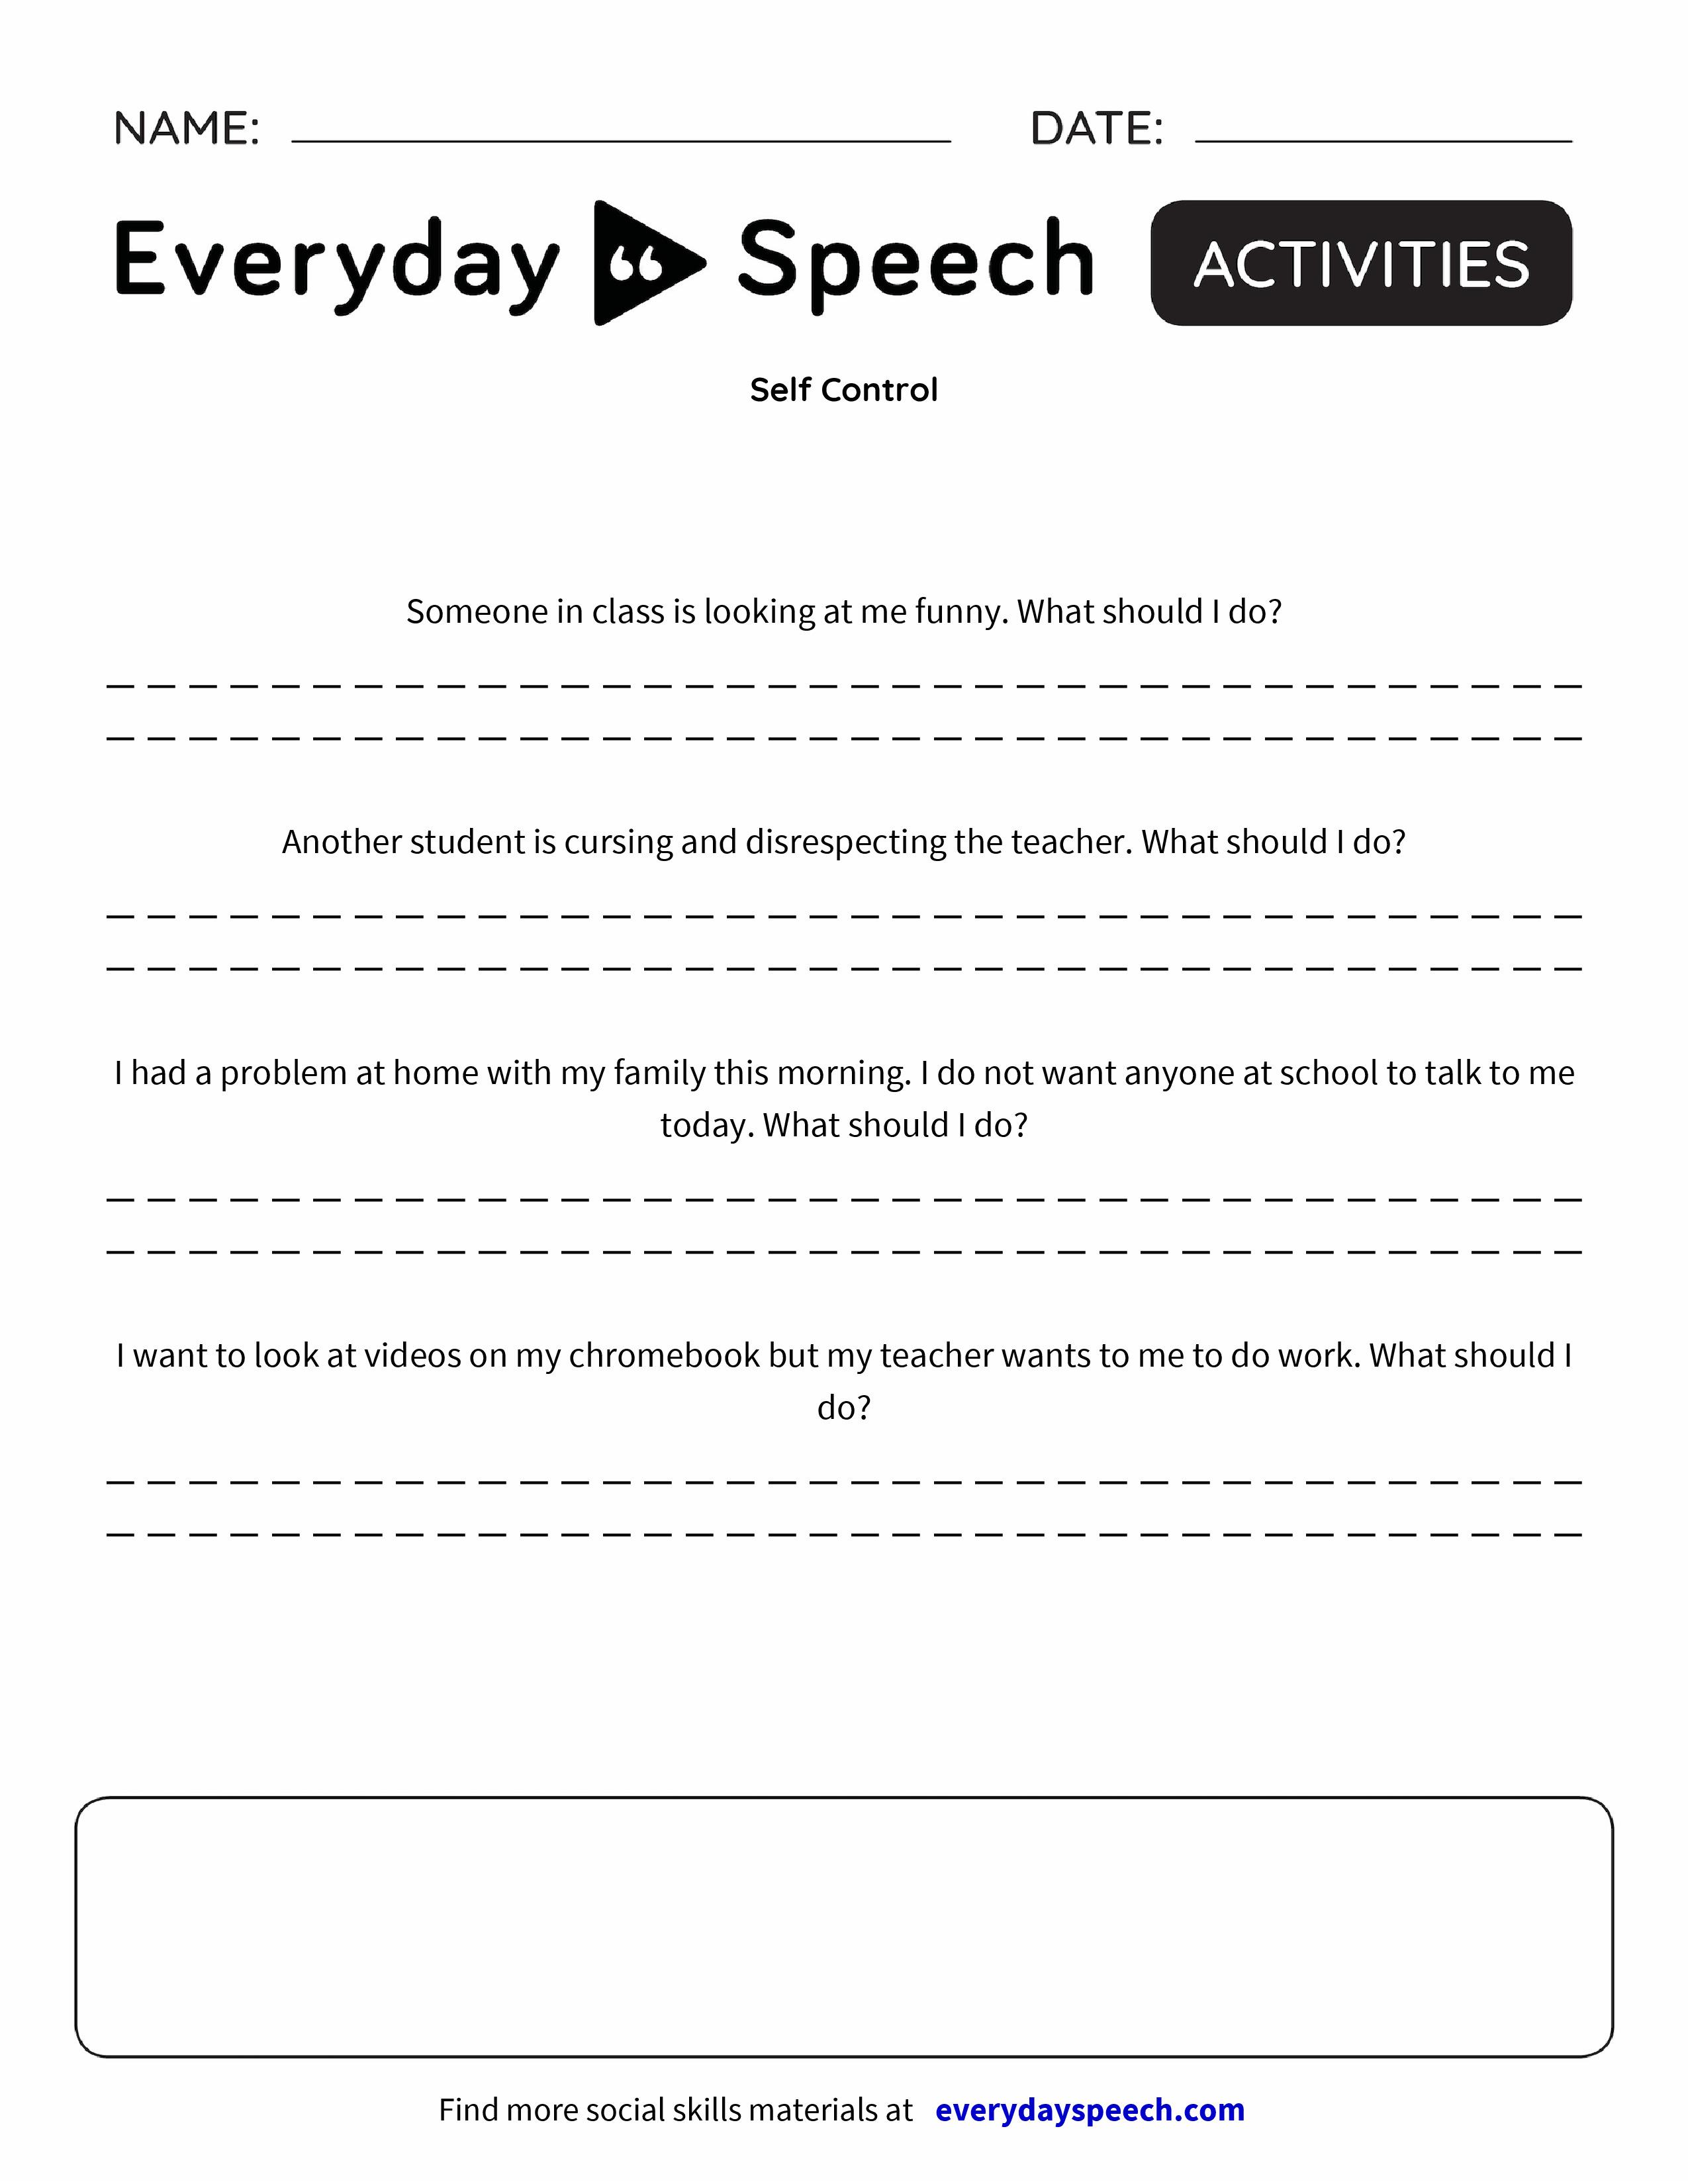 Self Control Everyday Speech Everyday Speech